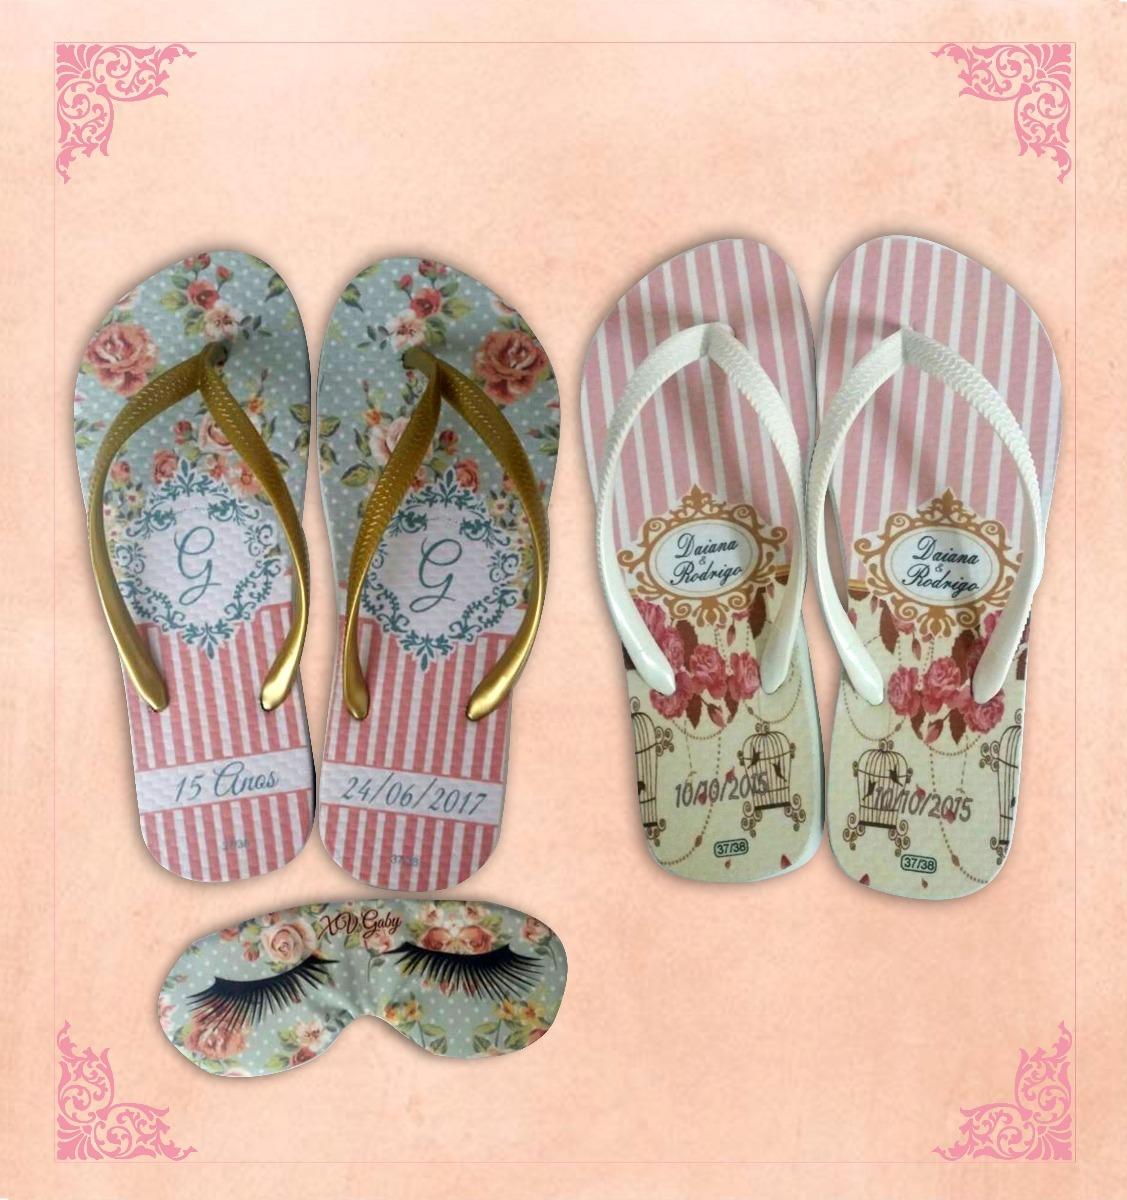 0b9907bbf Chinelos Personalizados Flamingo Rosa Tropical Summer Festa - R$ 6 ...